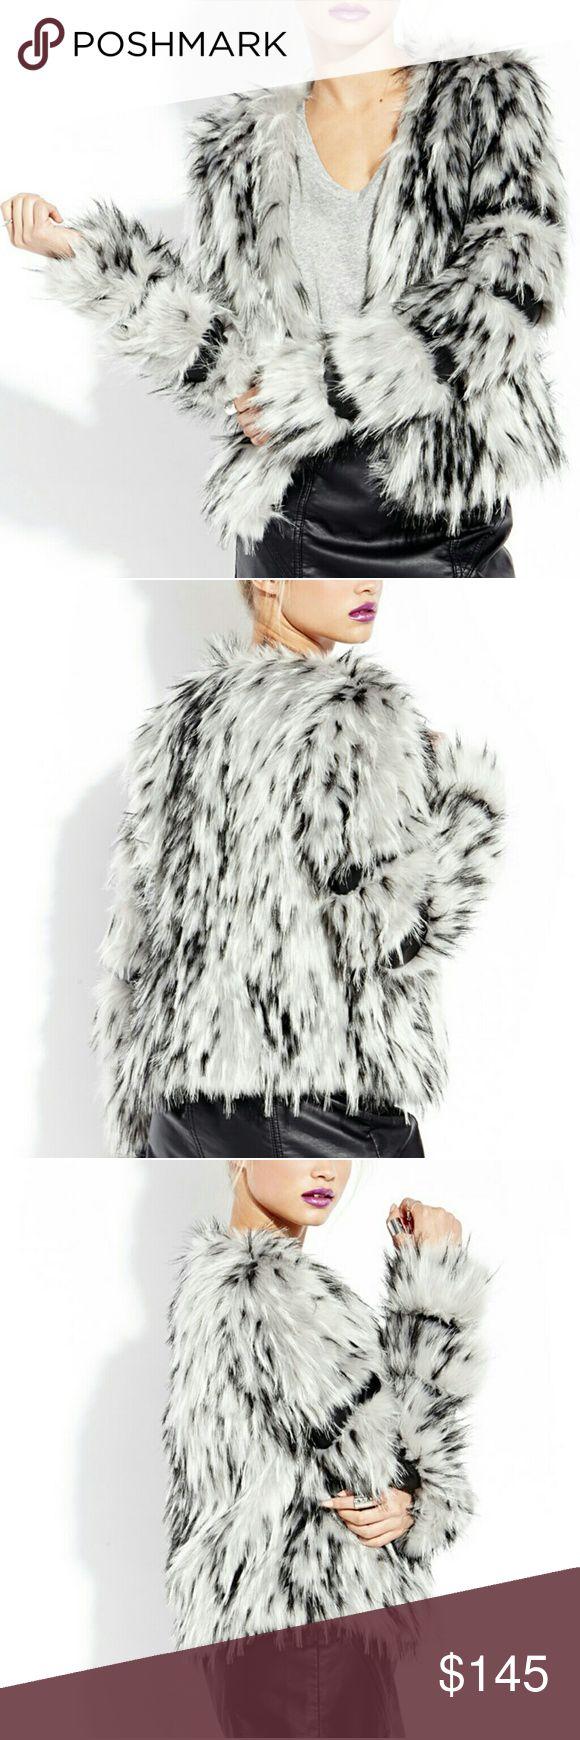 Black and white faux fur jacket CHOIES faux fur jacket NWOT. Sad to let this beauty go :( CHOIES Jackets & Coats